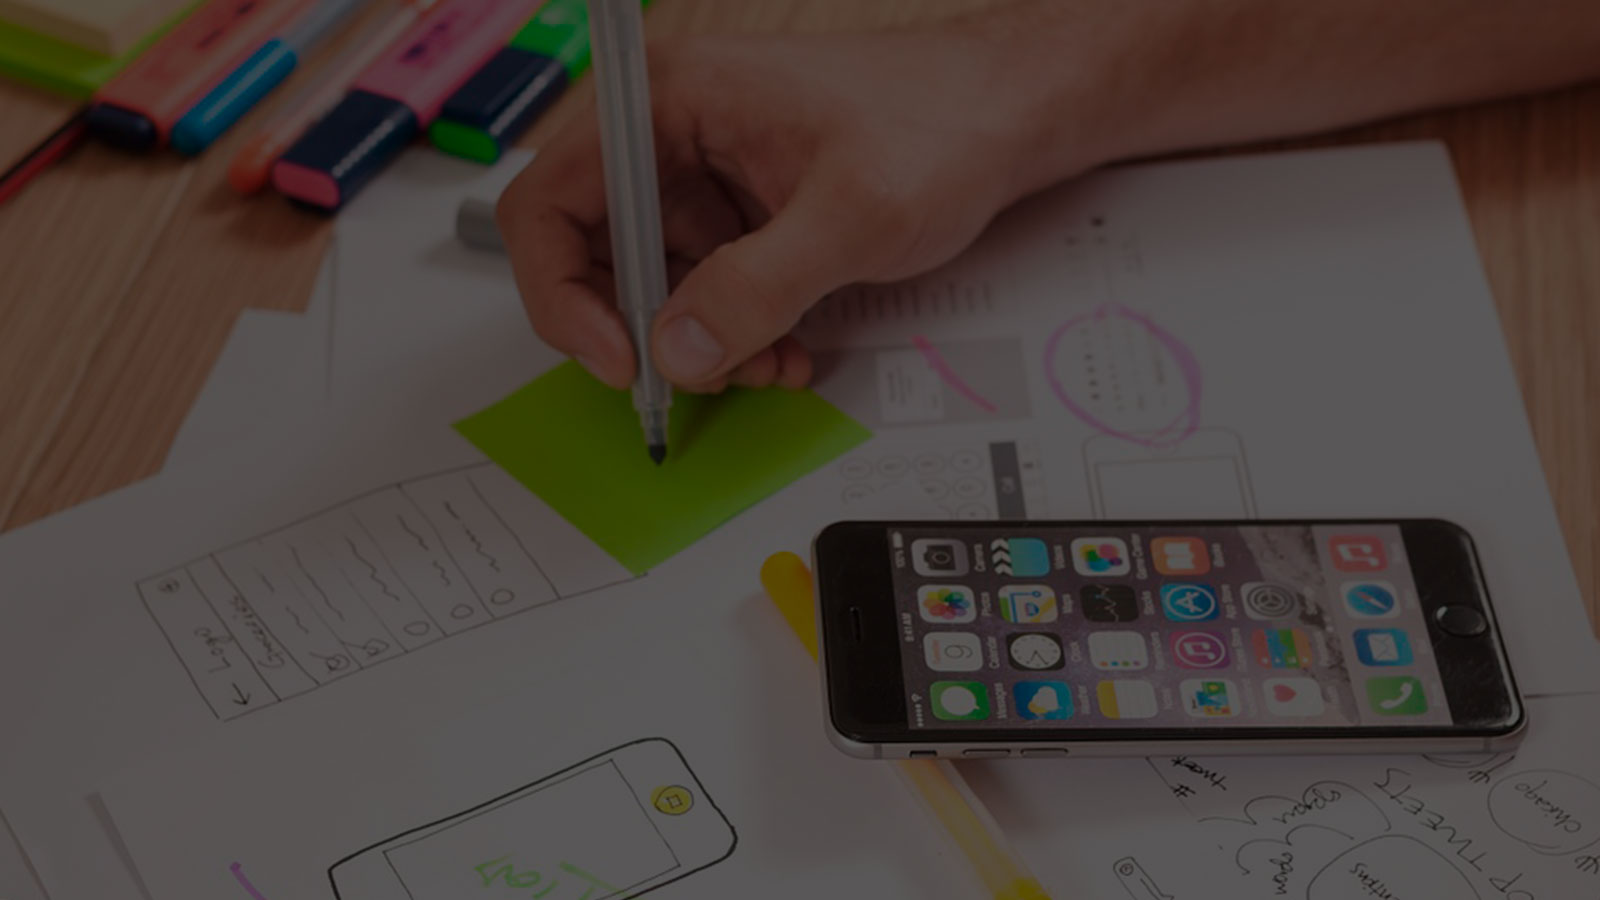 aplicativos para administradores de empresas